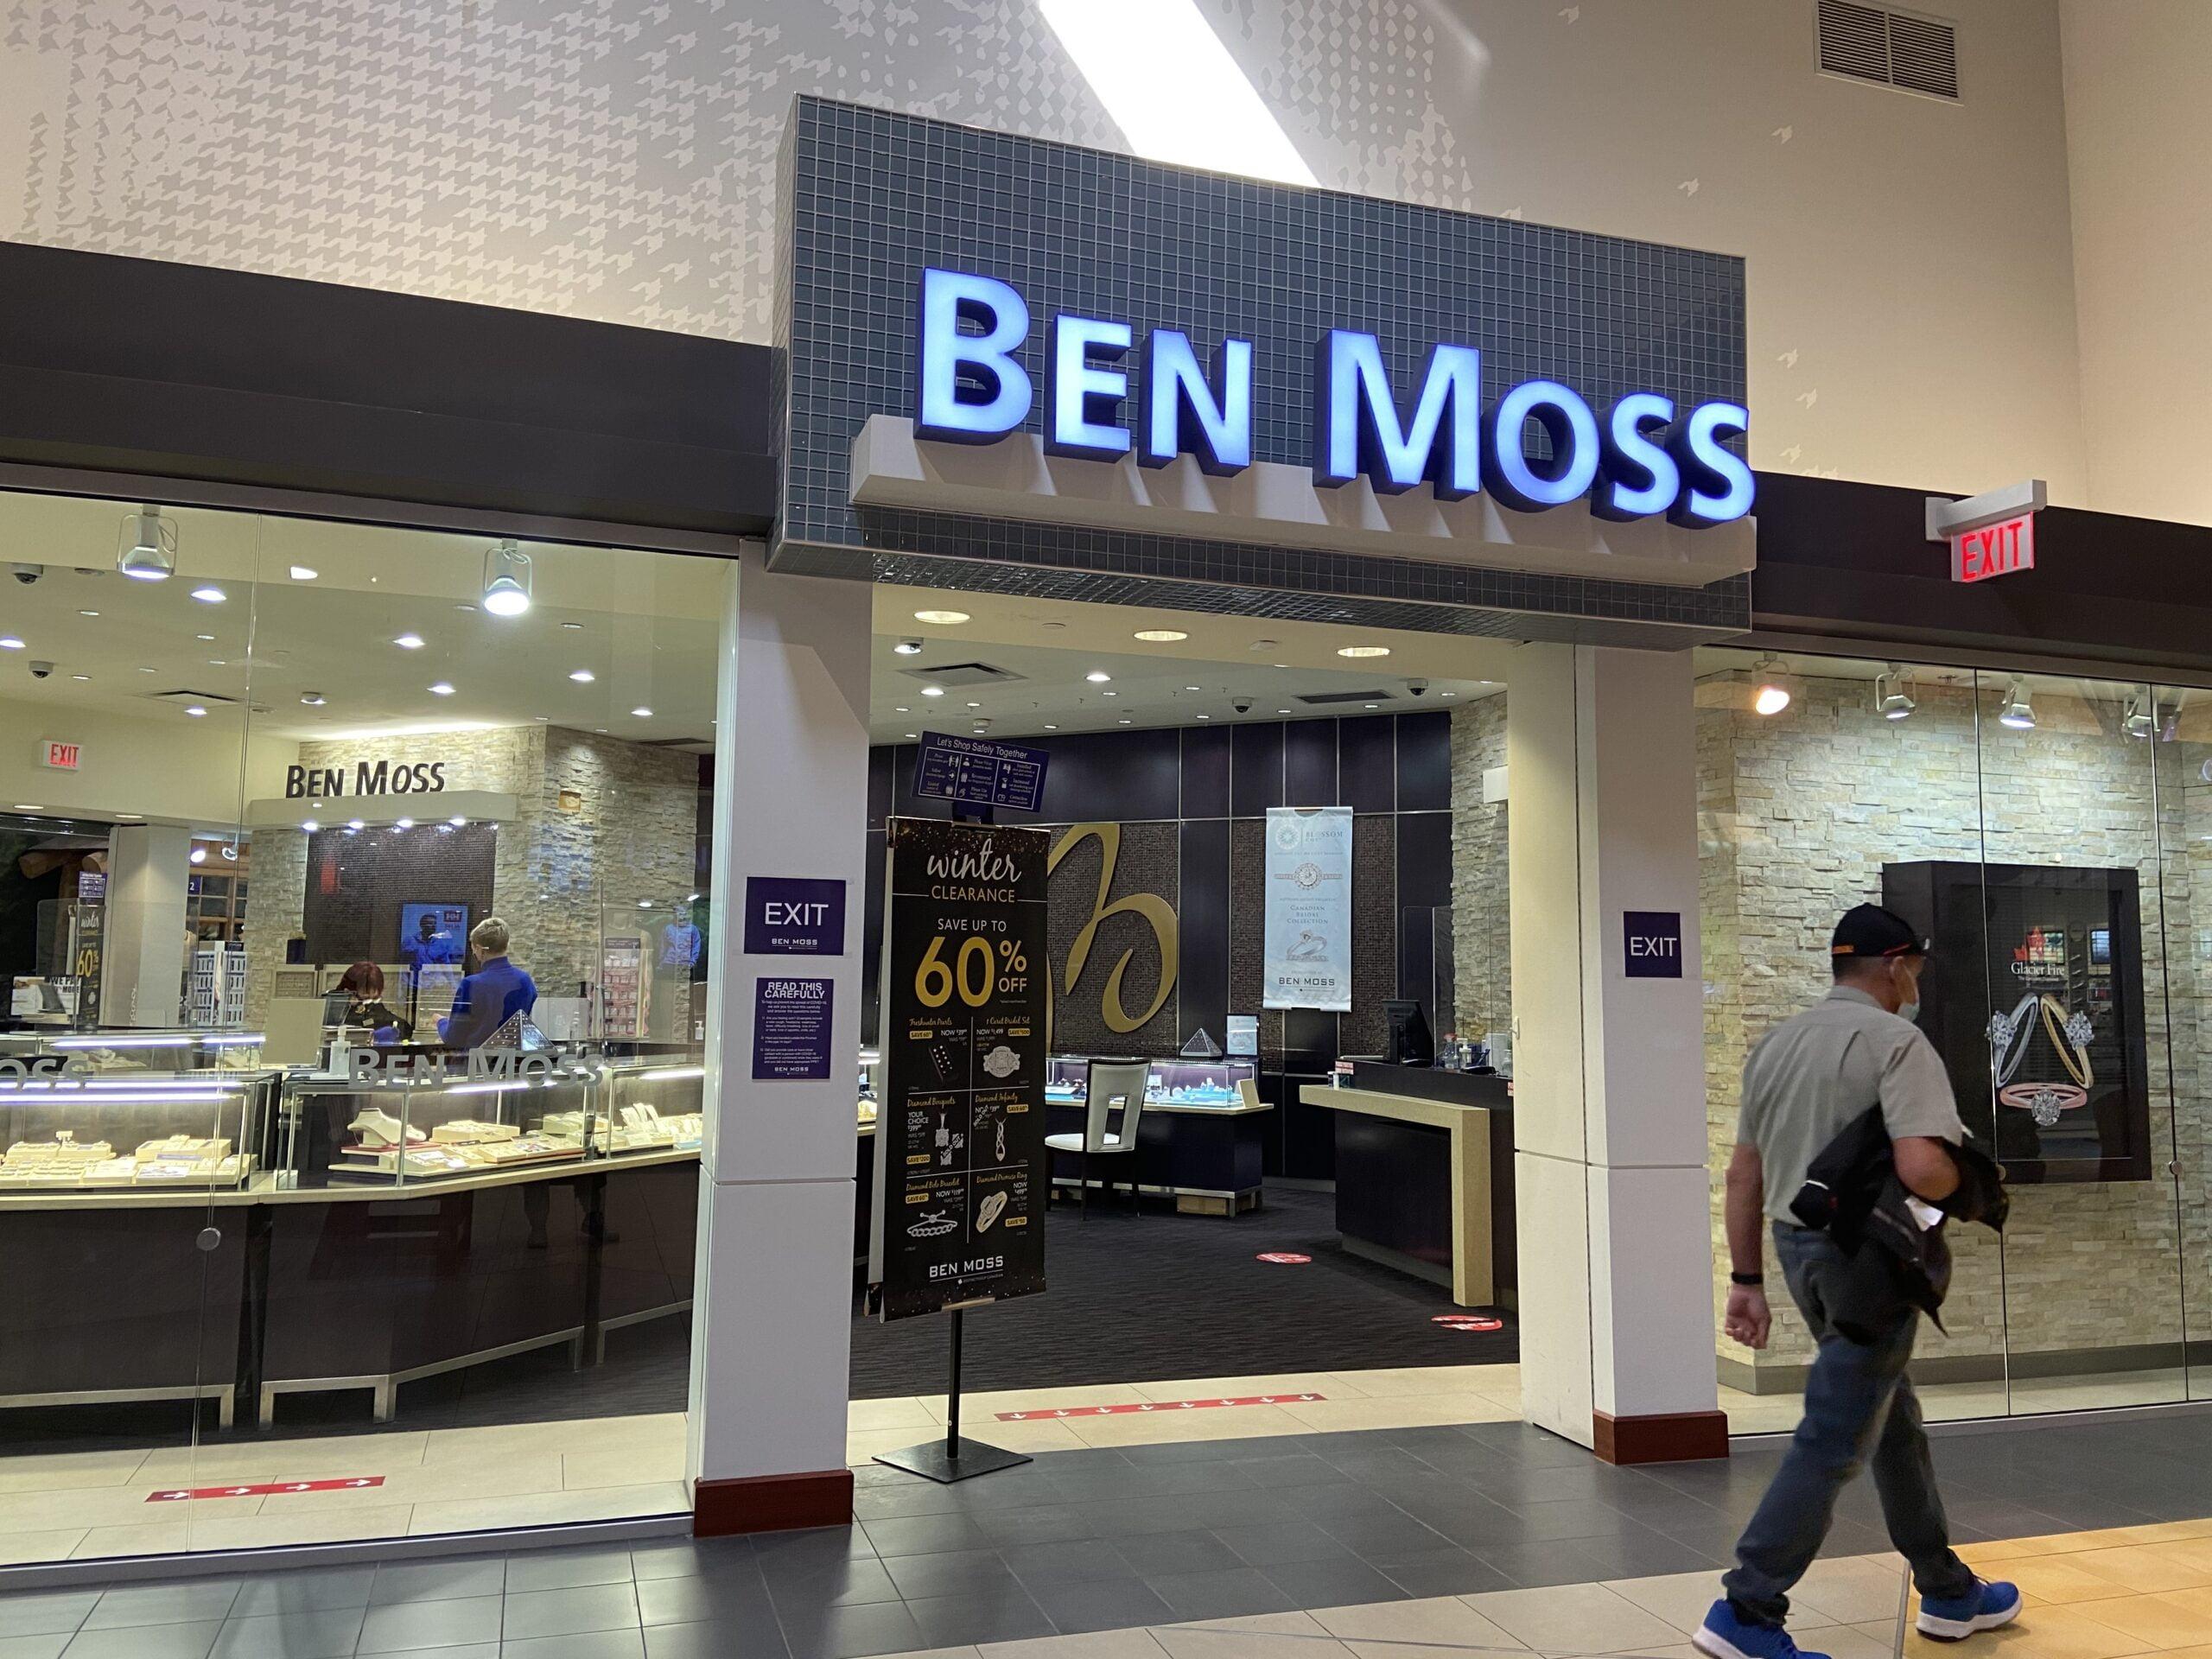 Ben Moss at CrossIron Mills